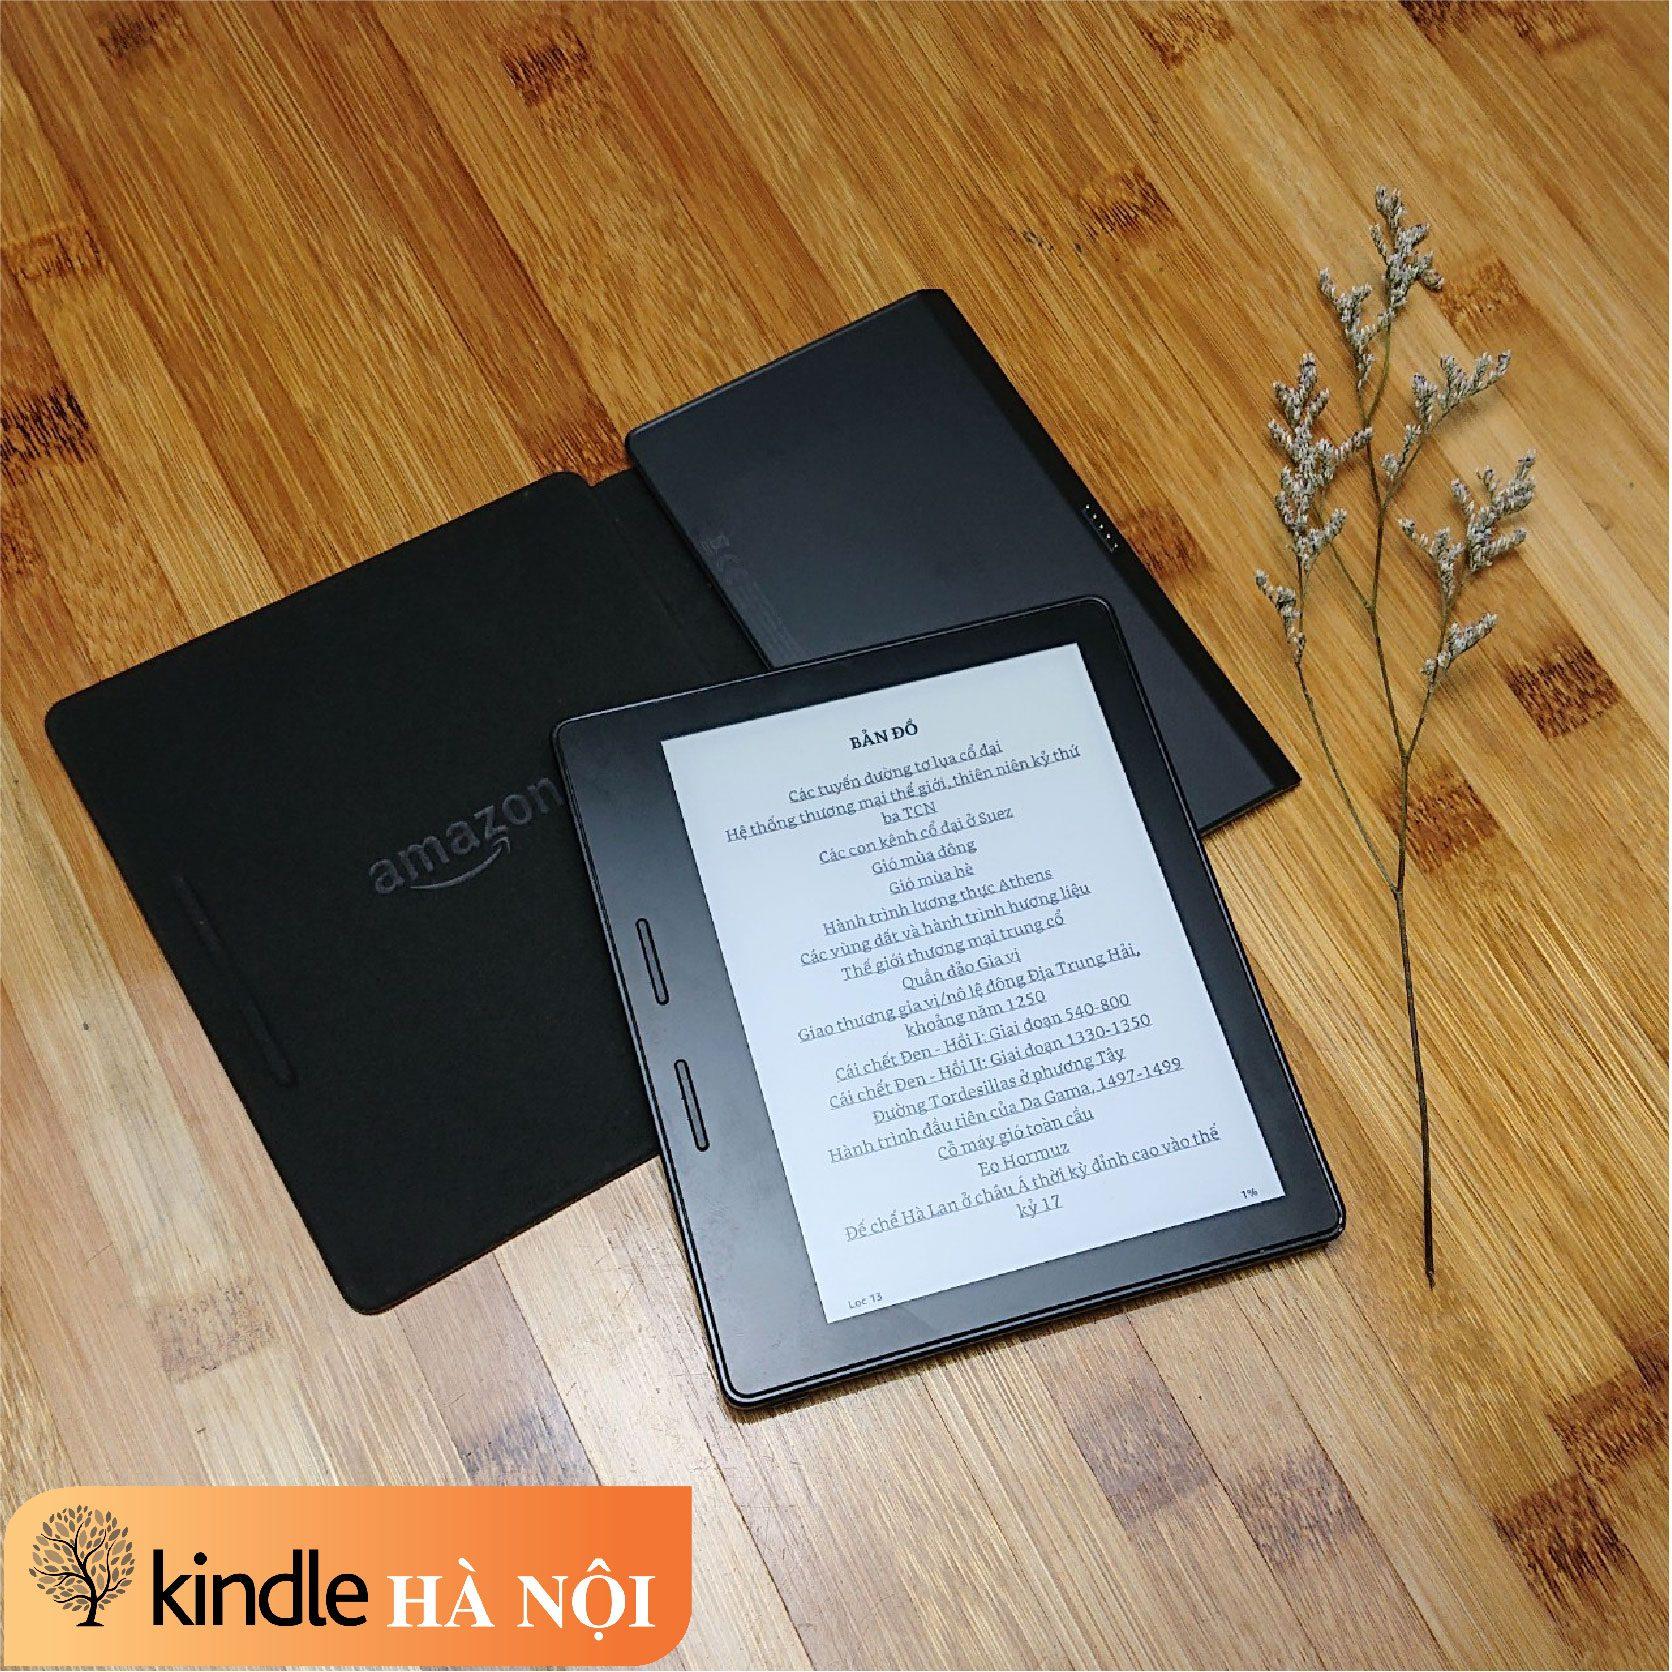 Kindle Oasis 1 - kindlehanoivn-007-01